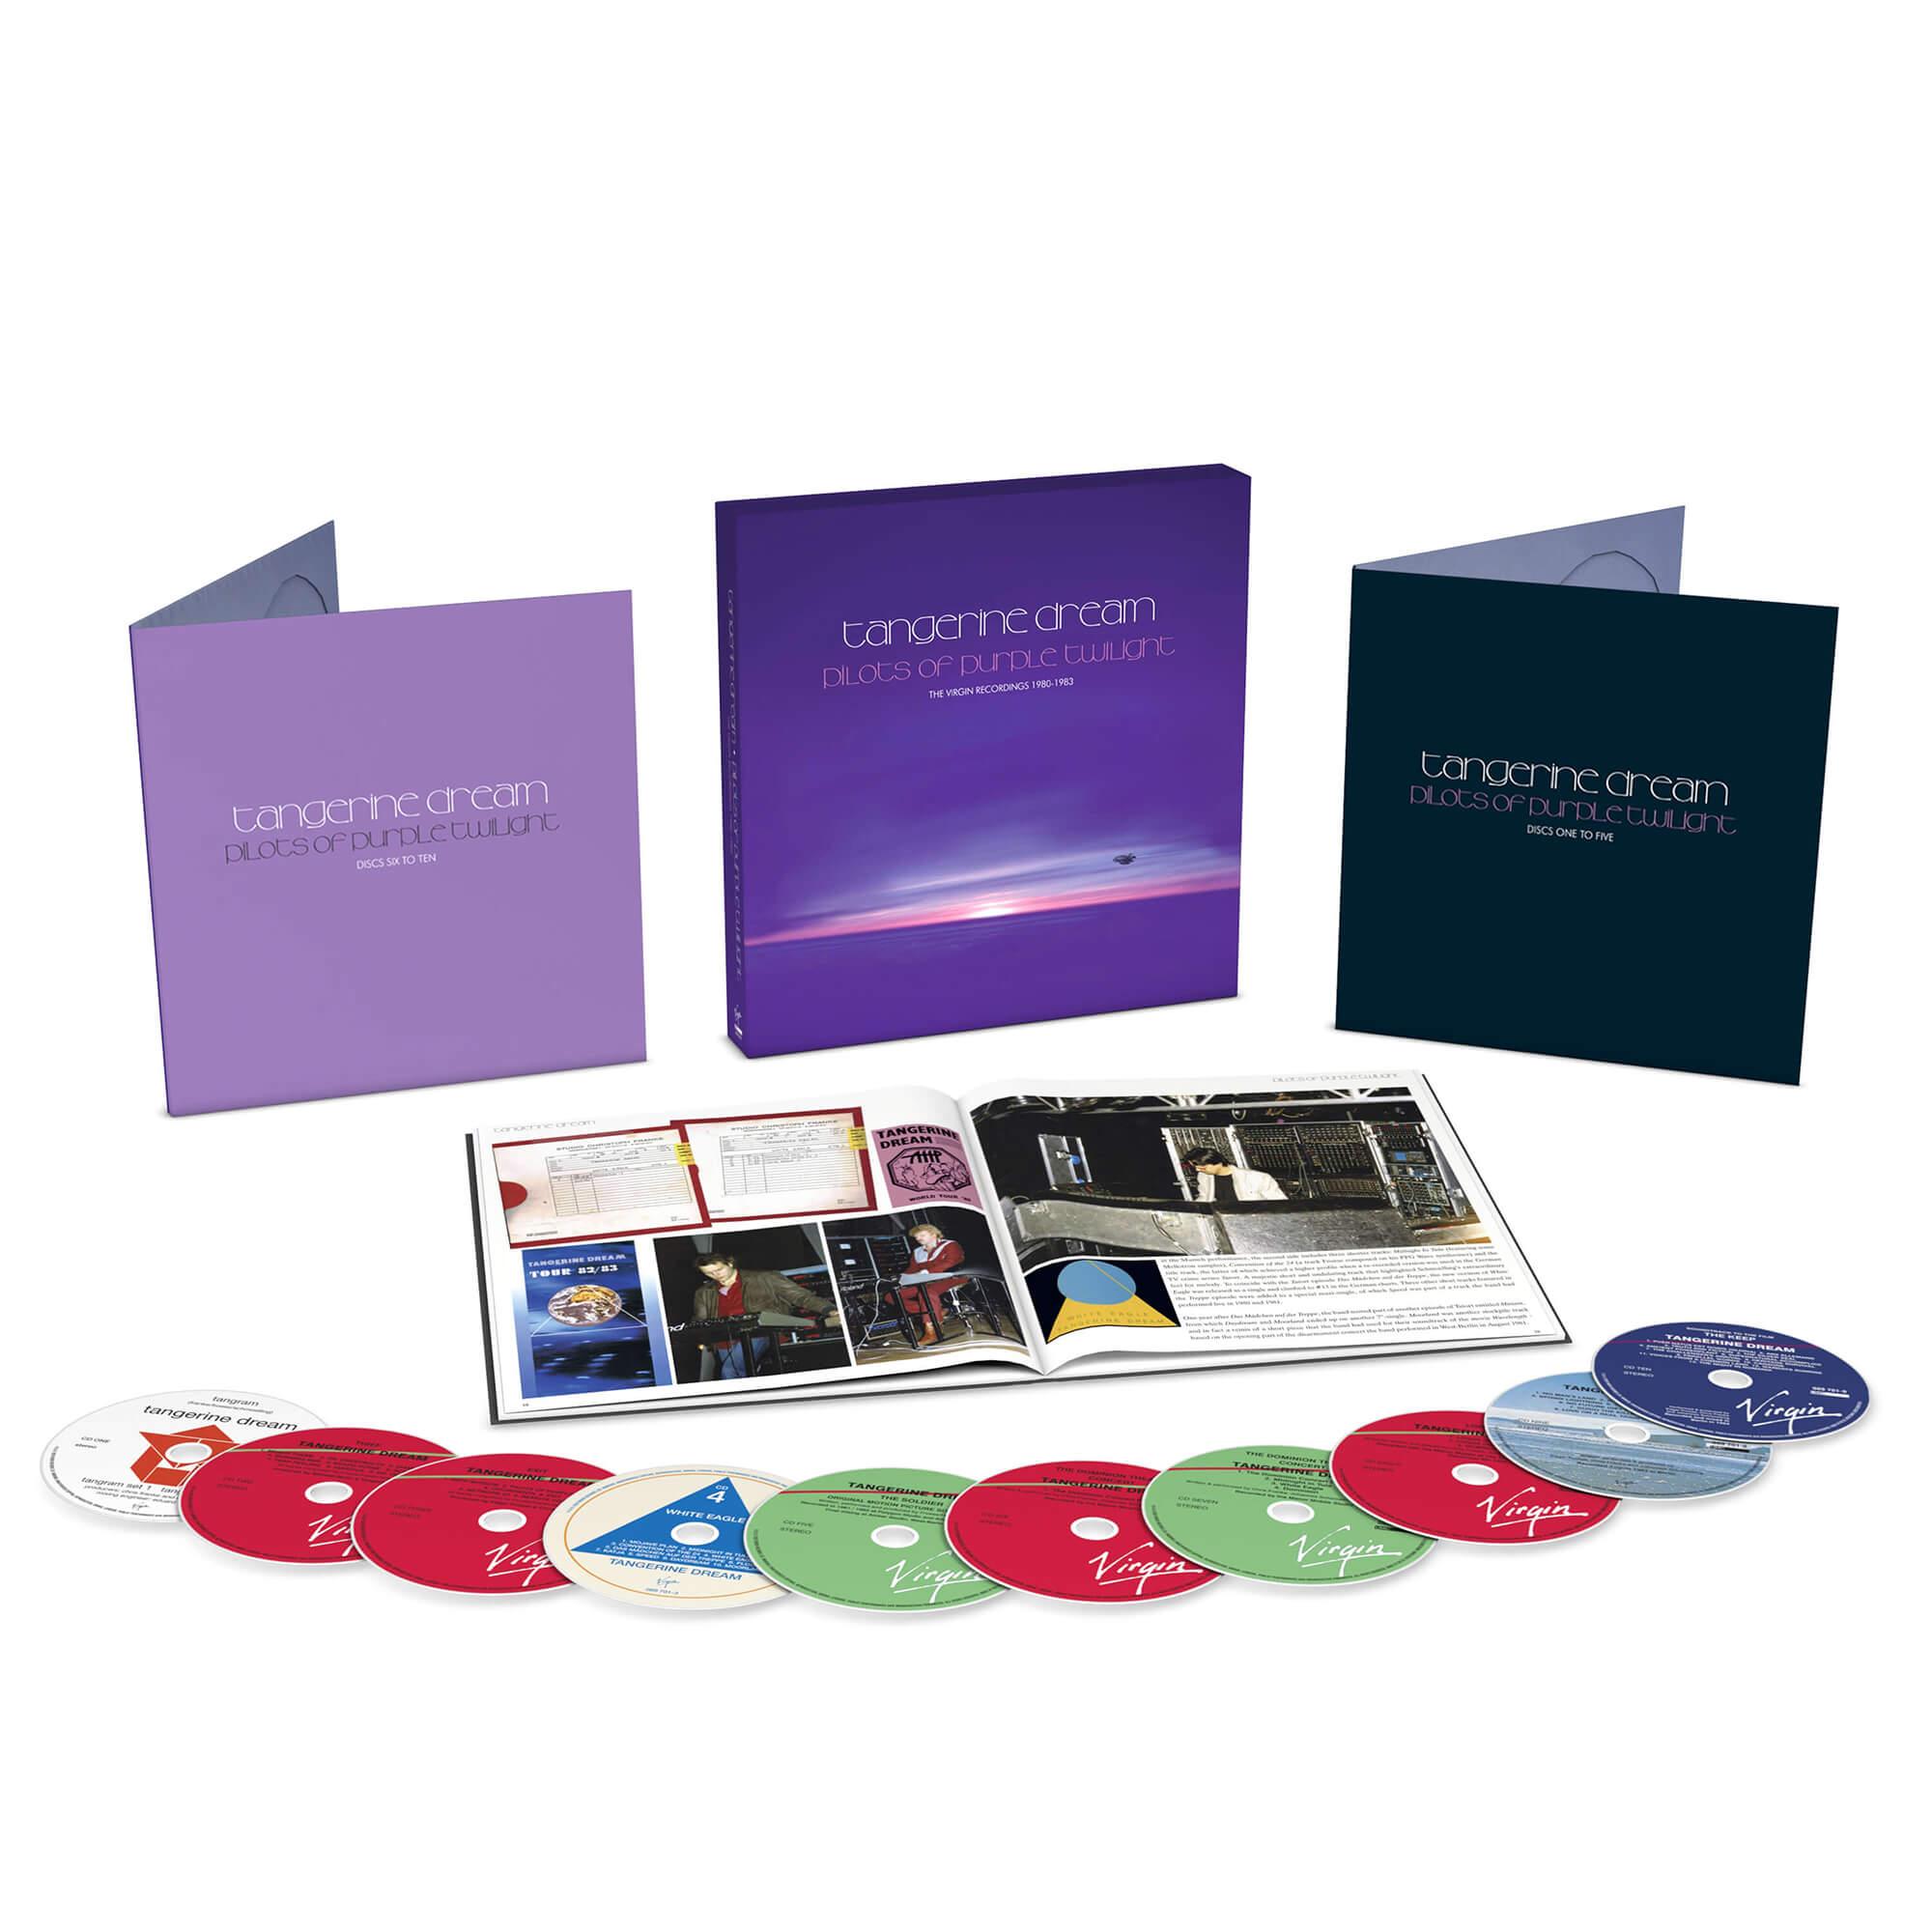 Tangerine Dream - Pilots Of Purple Twilight: The Virgin Recordings 1980 - 1983